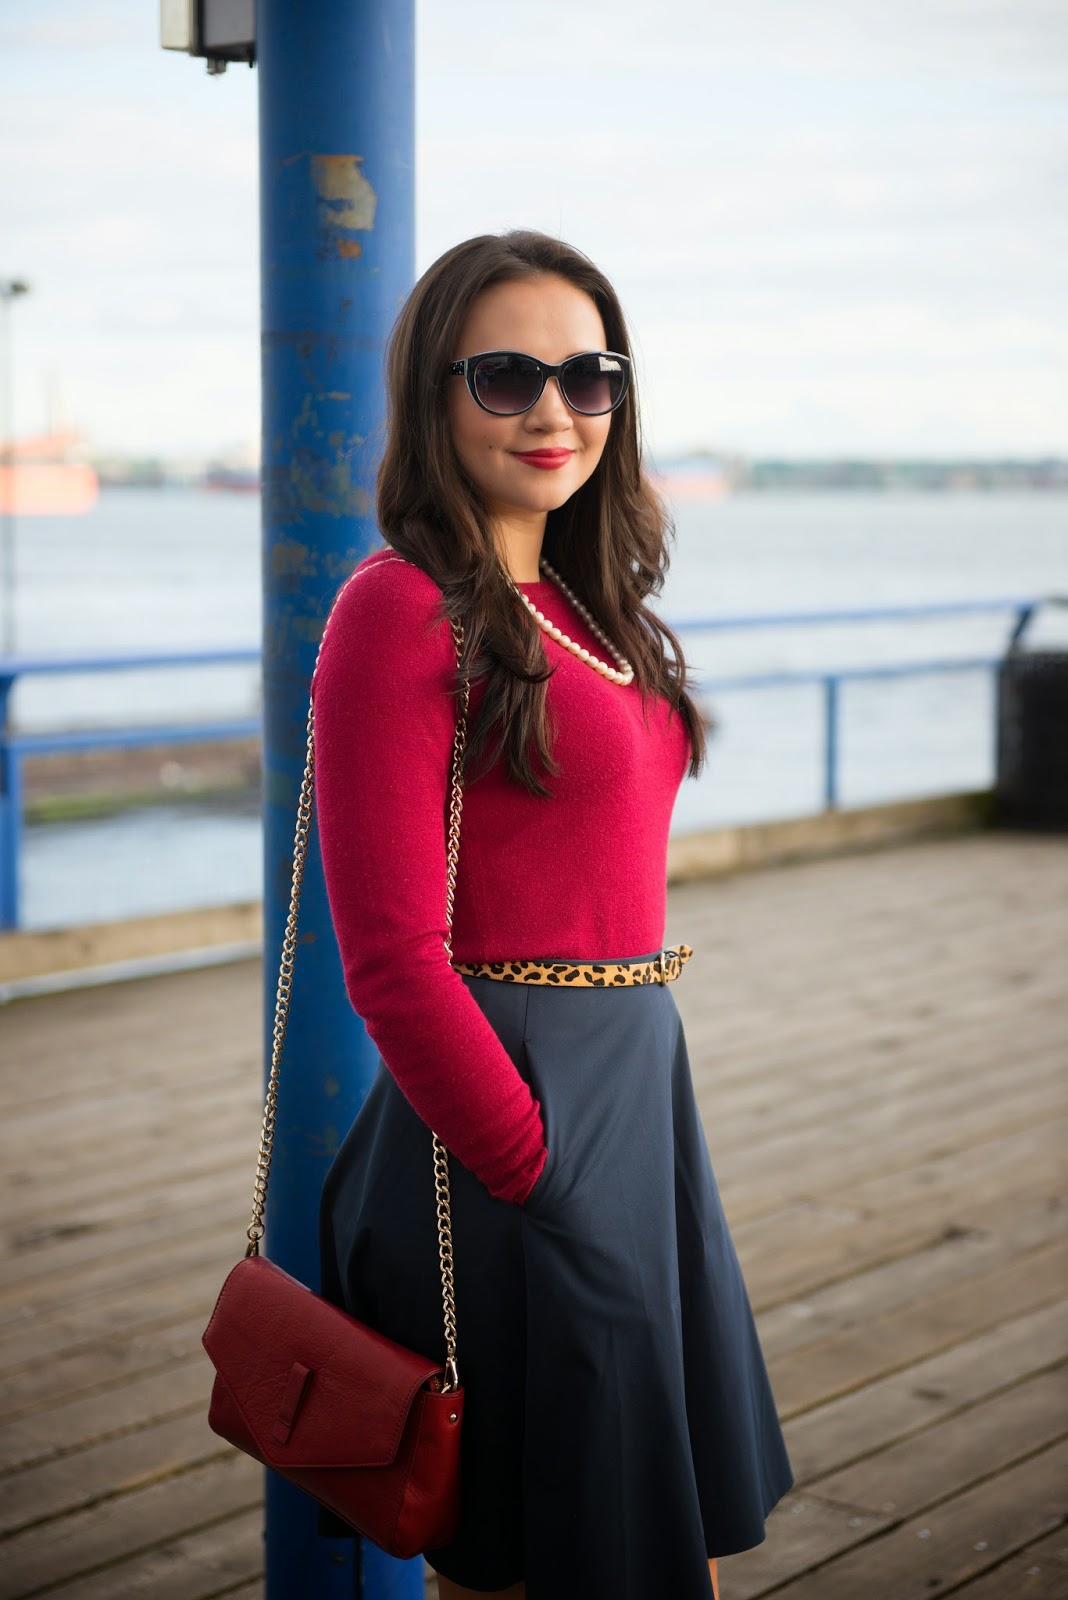 Broken Stiletto, vancouver style blog, vancouver fashion blog, vancouver travel blog